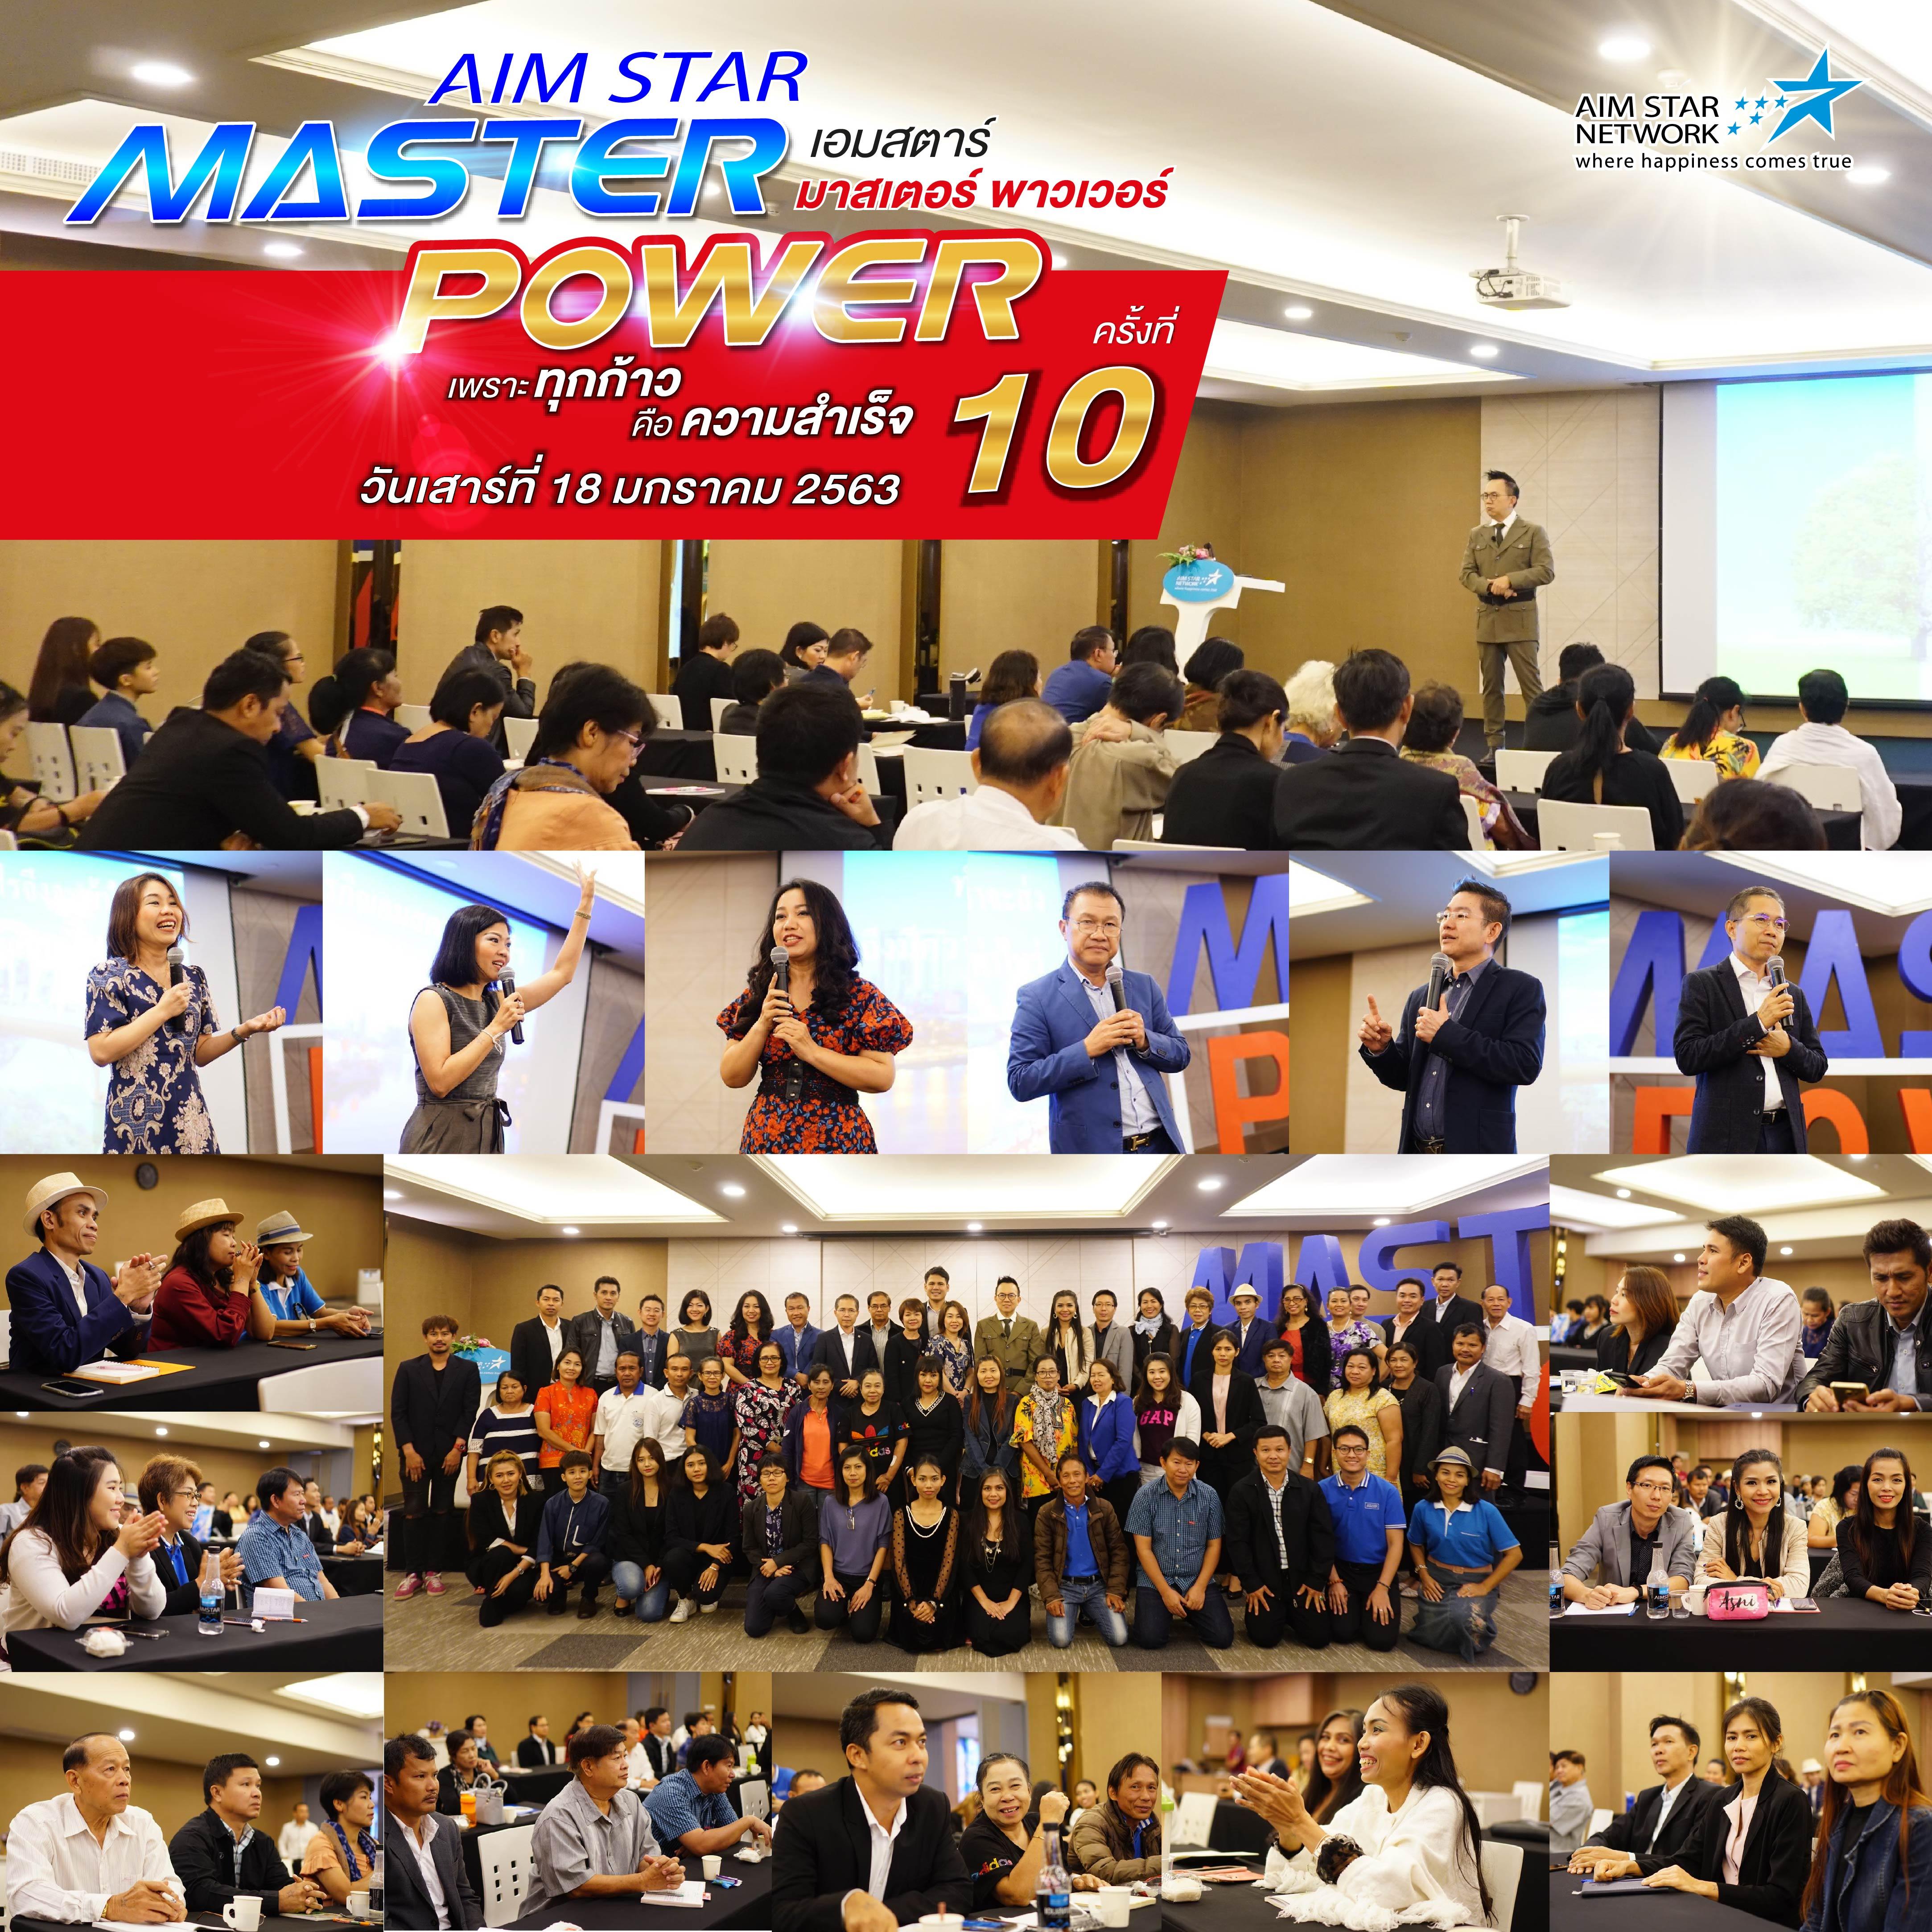 AIM STAR Master Power ครั้งที่ 10 เพราะทุกก้าว คือ ความสำเร็จ